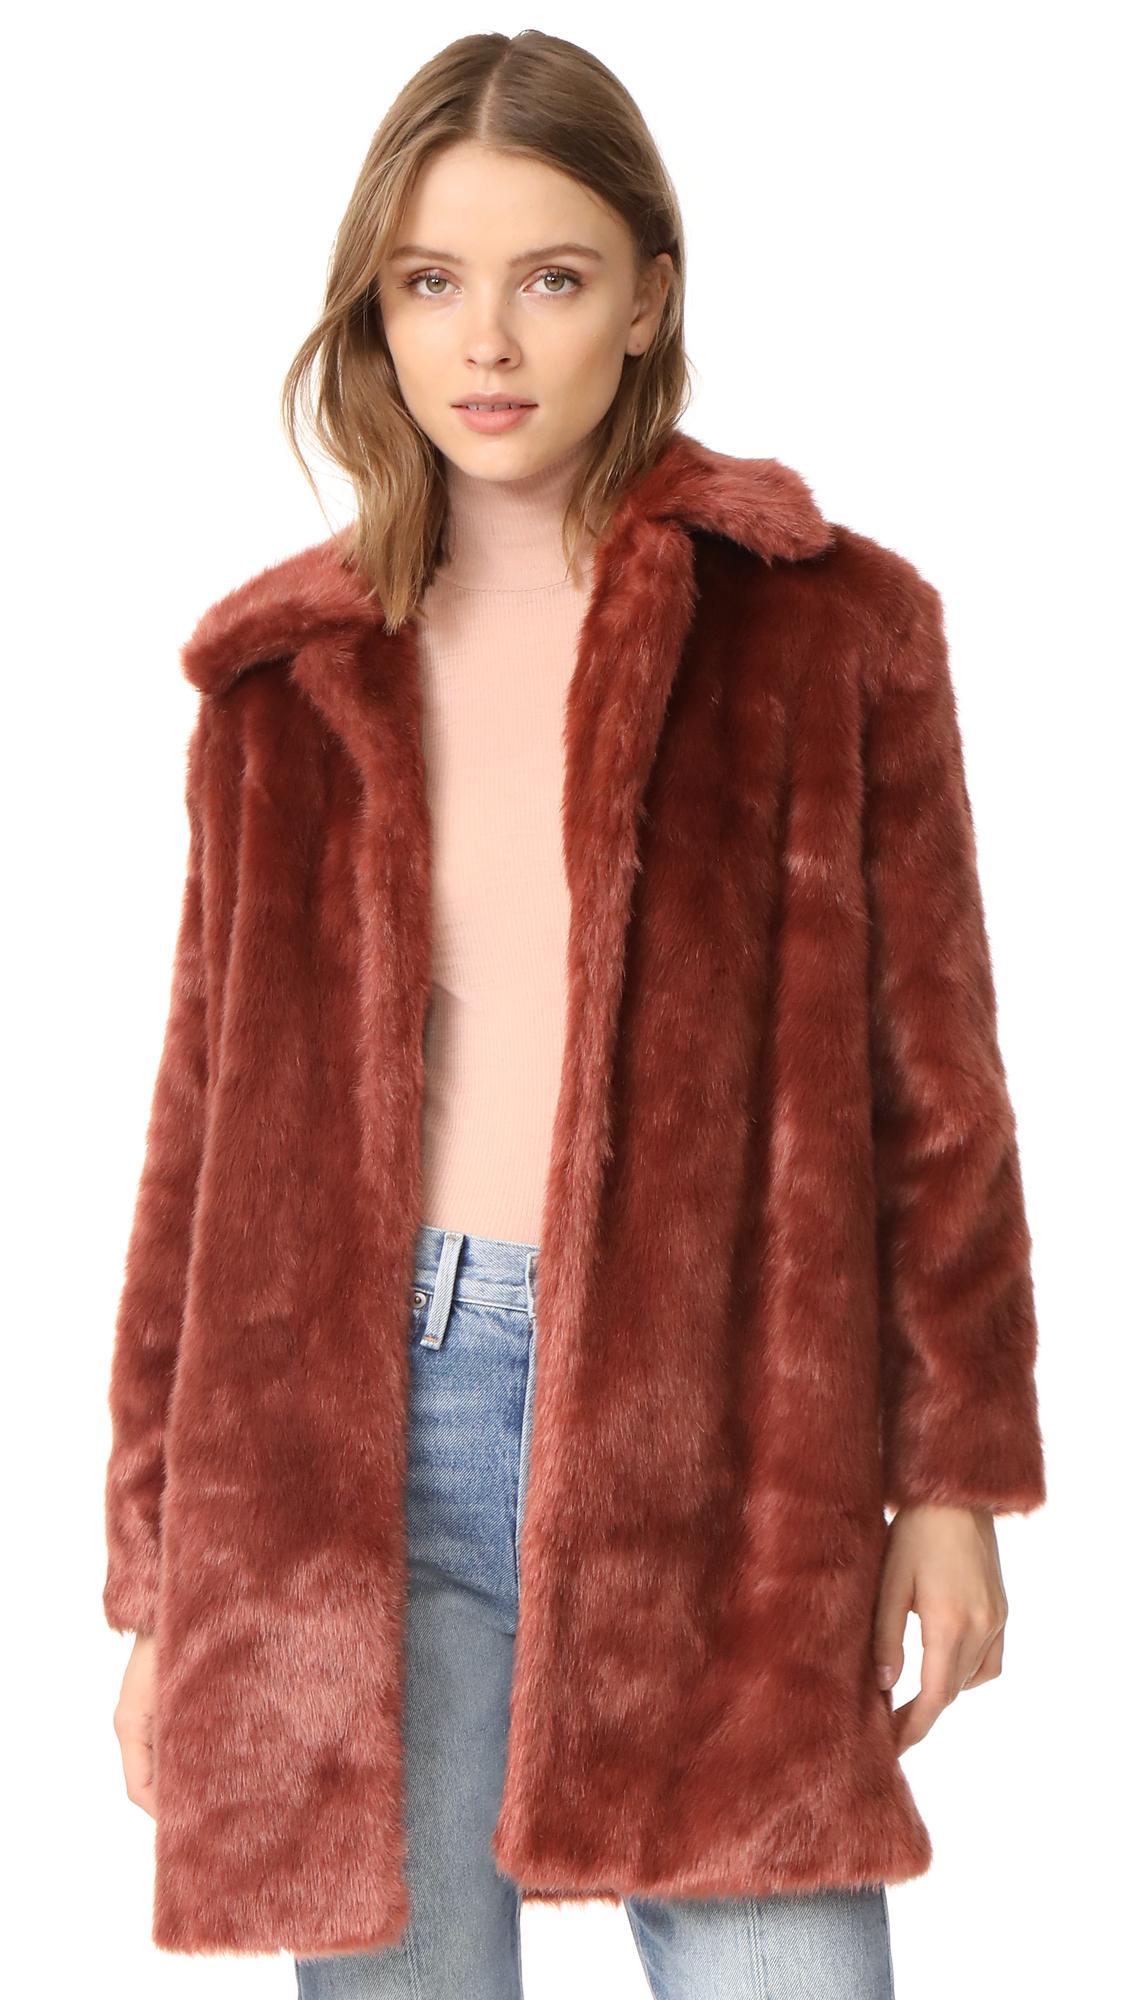 FRAME Faux Fur Coat - Spice